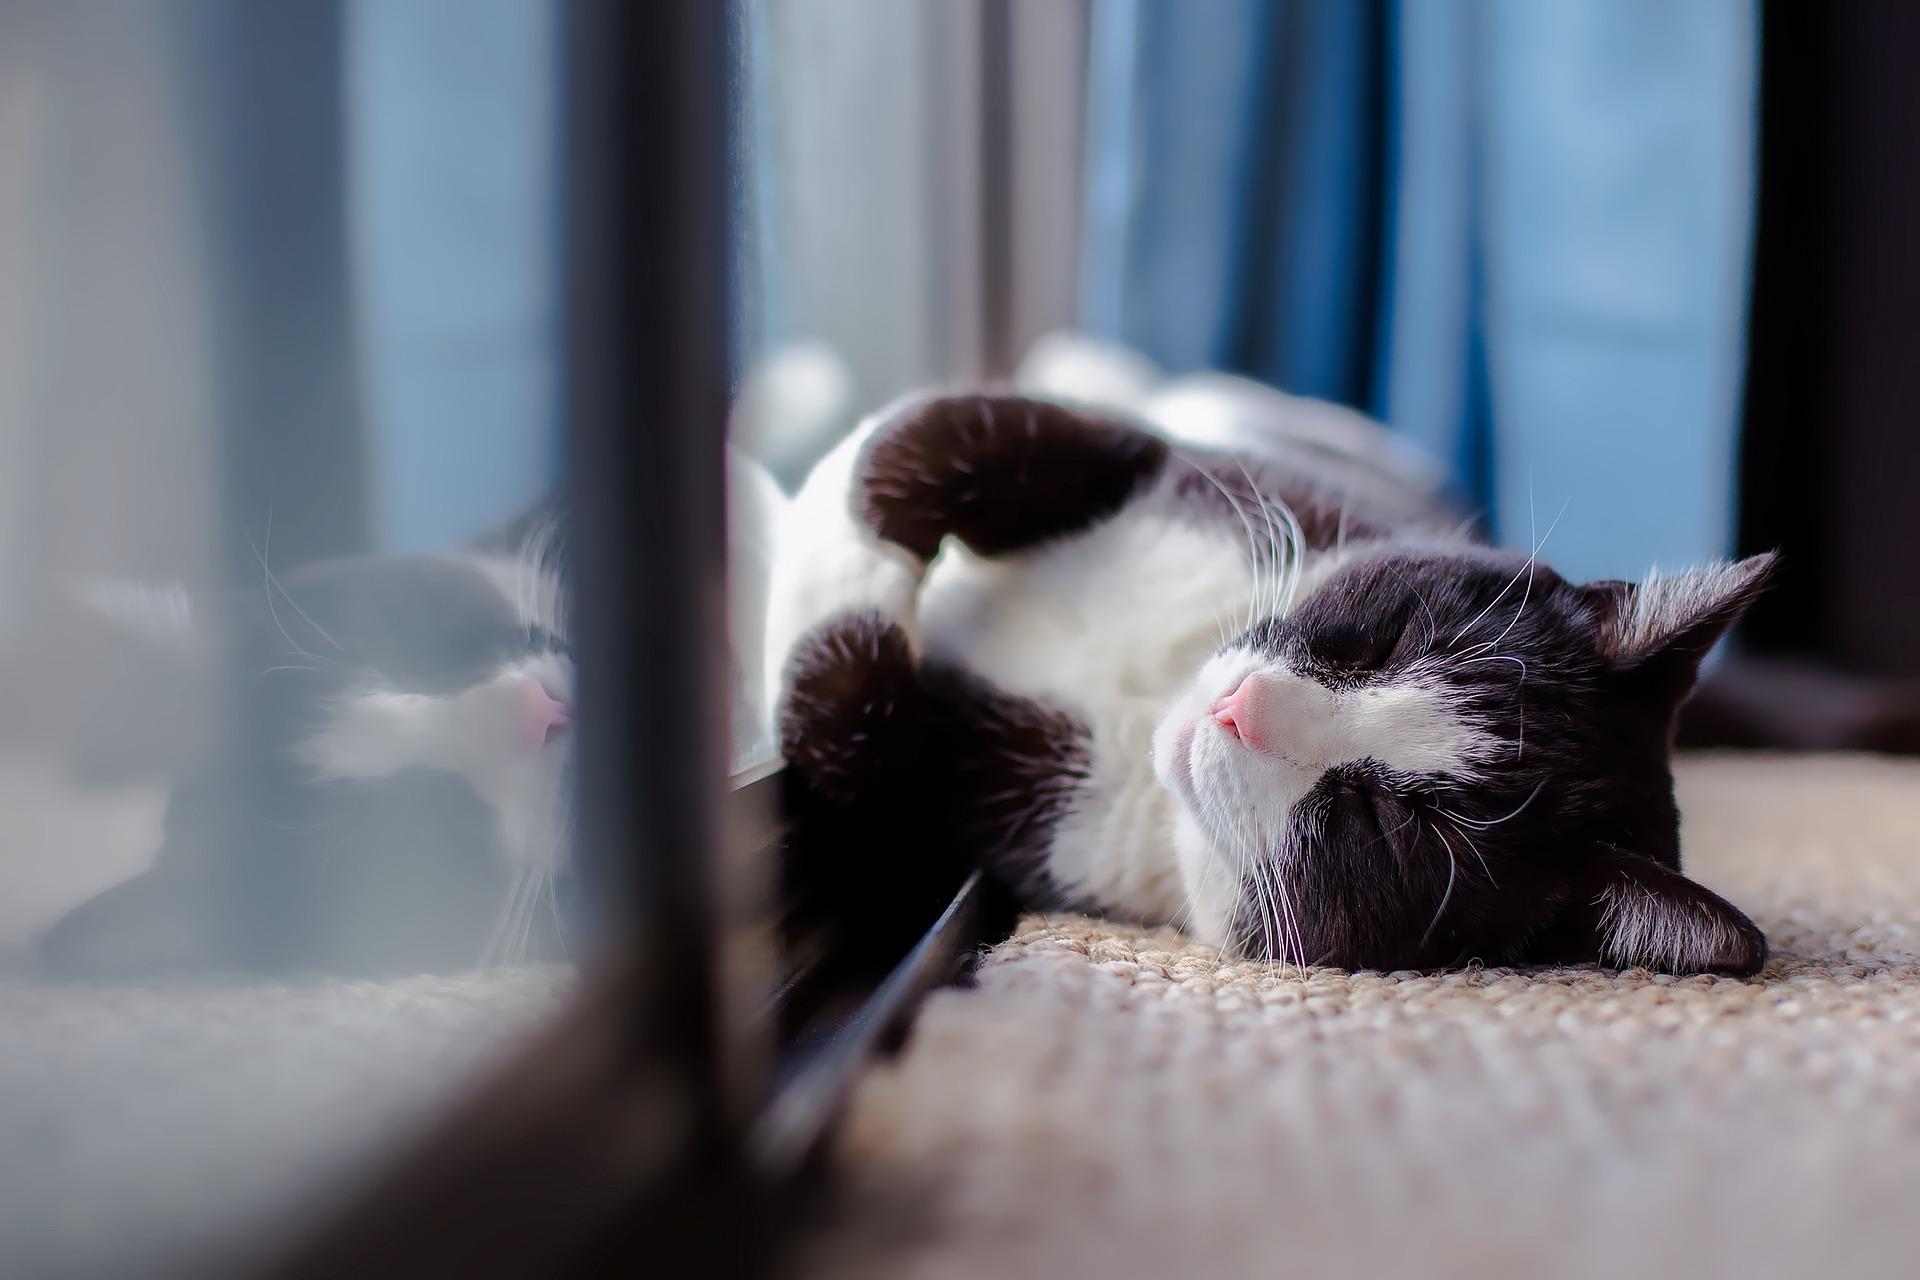 cat-1903024_1920.jpg